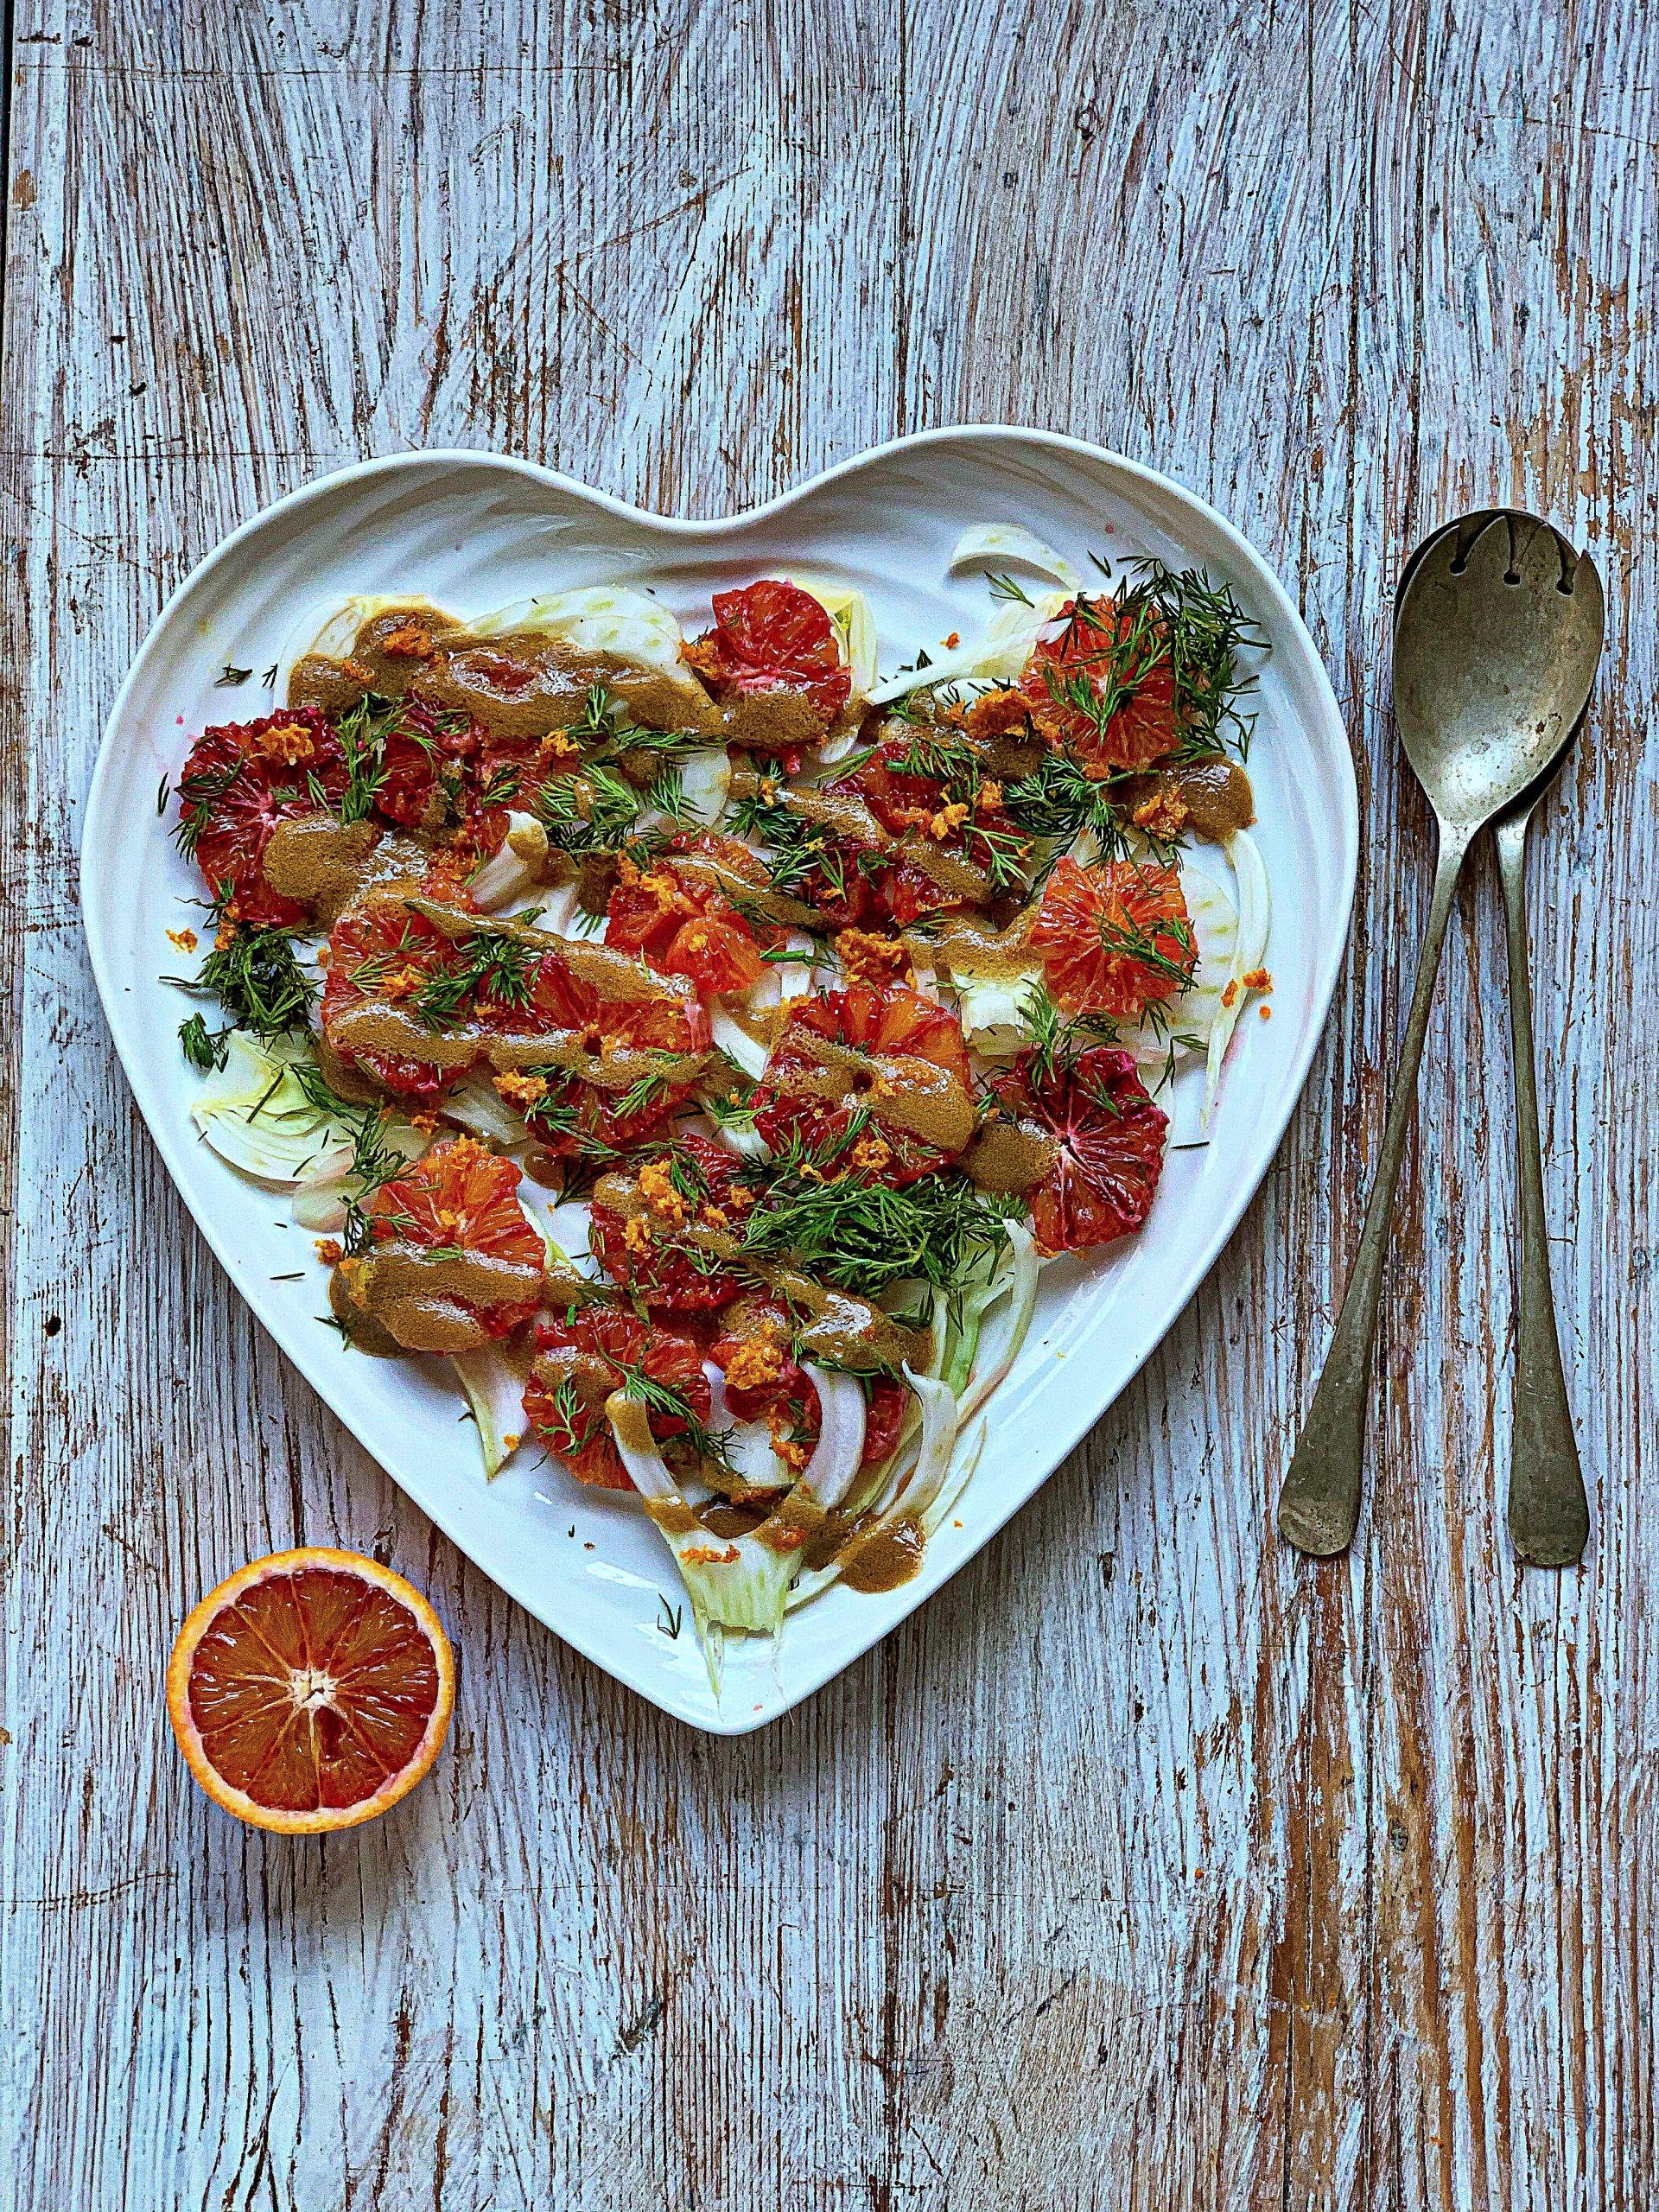 blood orange, fennel and dill salad pic: Kerstin rodgers/msmarmitelover.com